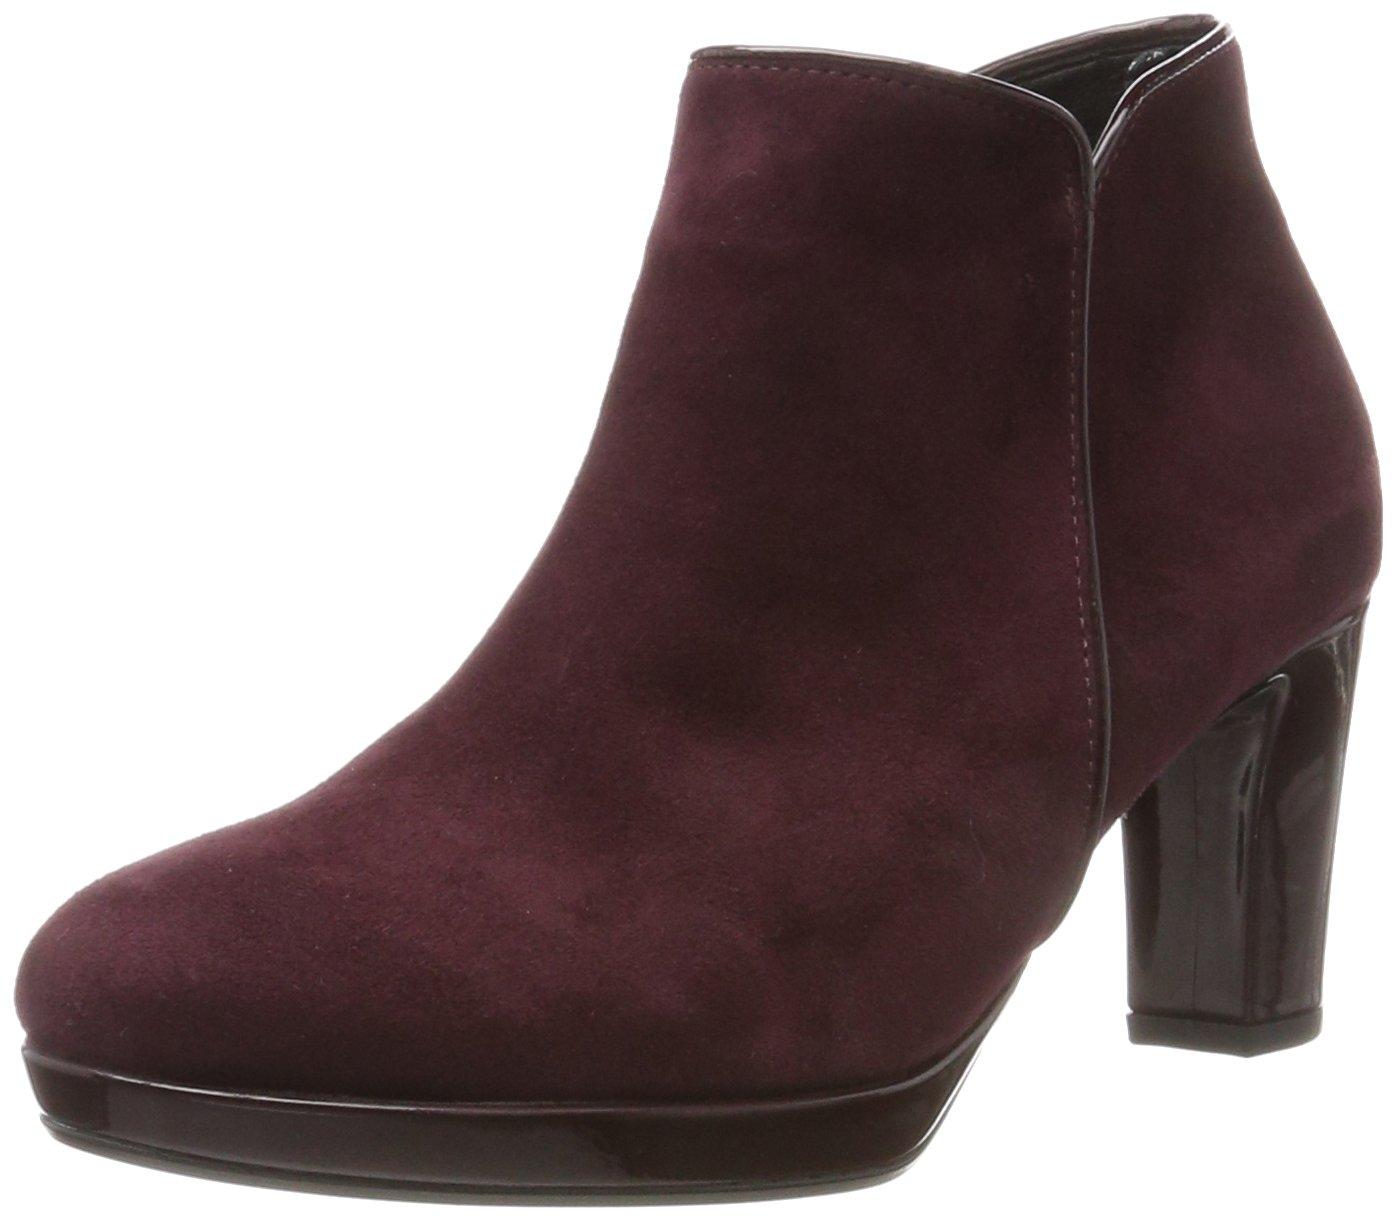 Gabor Shoes Comfort Basic, Botas para Mujer Rojo (New Merlot Ldf)